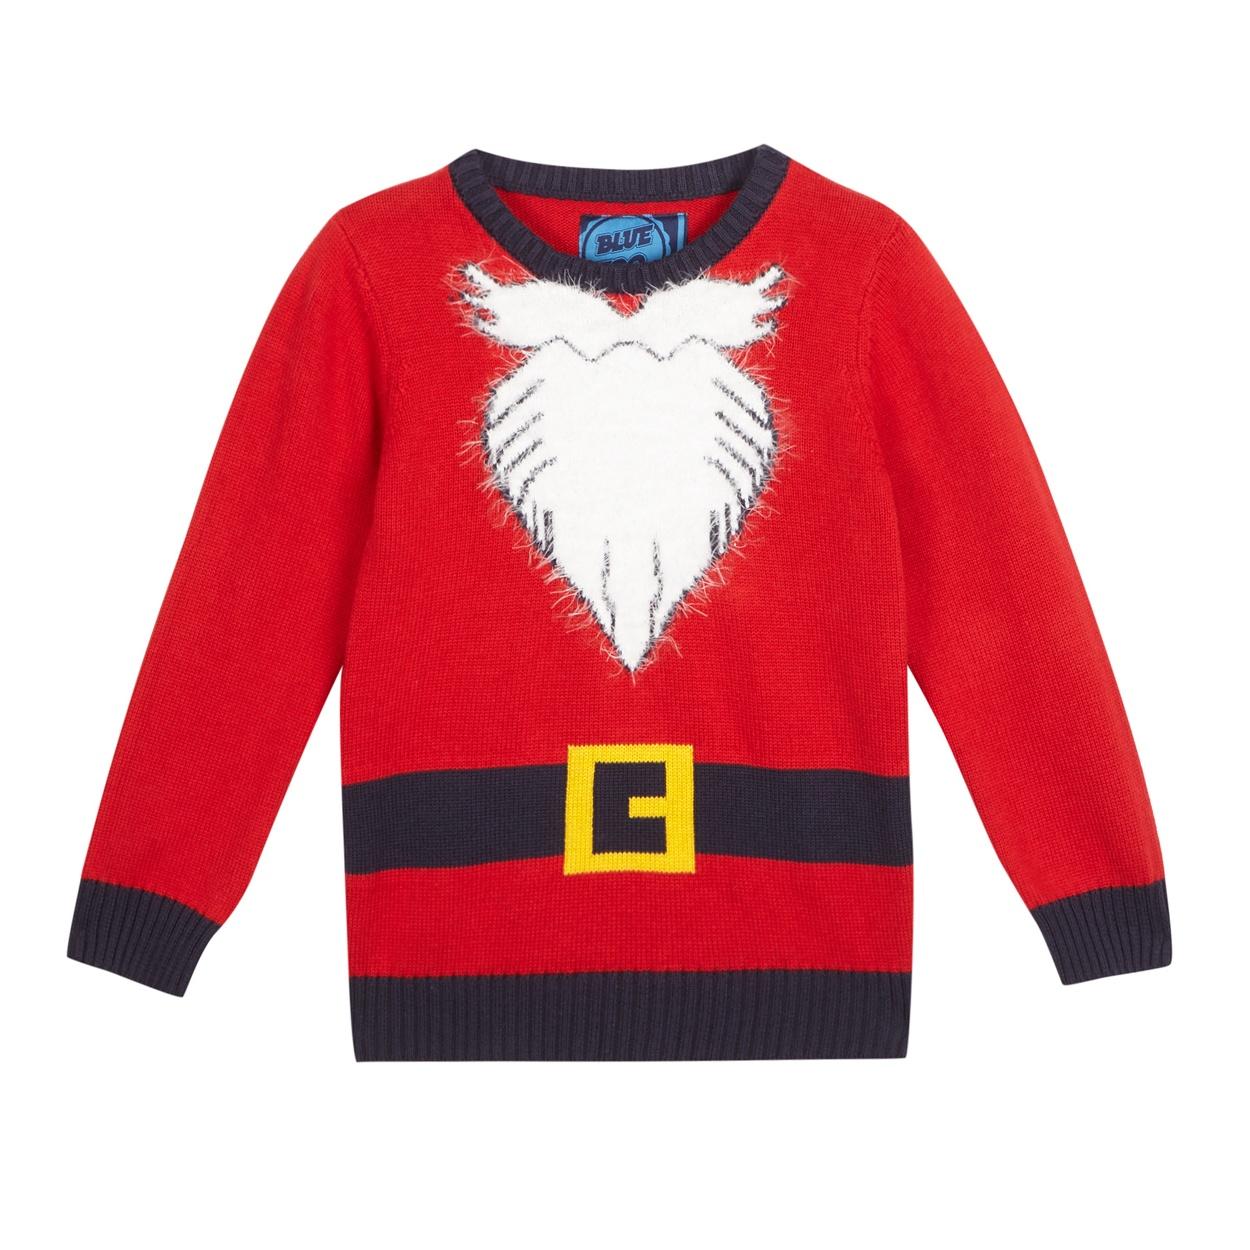 9dde8ea3d198 Weekly Wishlist #63: Kids Christmas Jumpers   Nest & Dressed